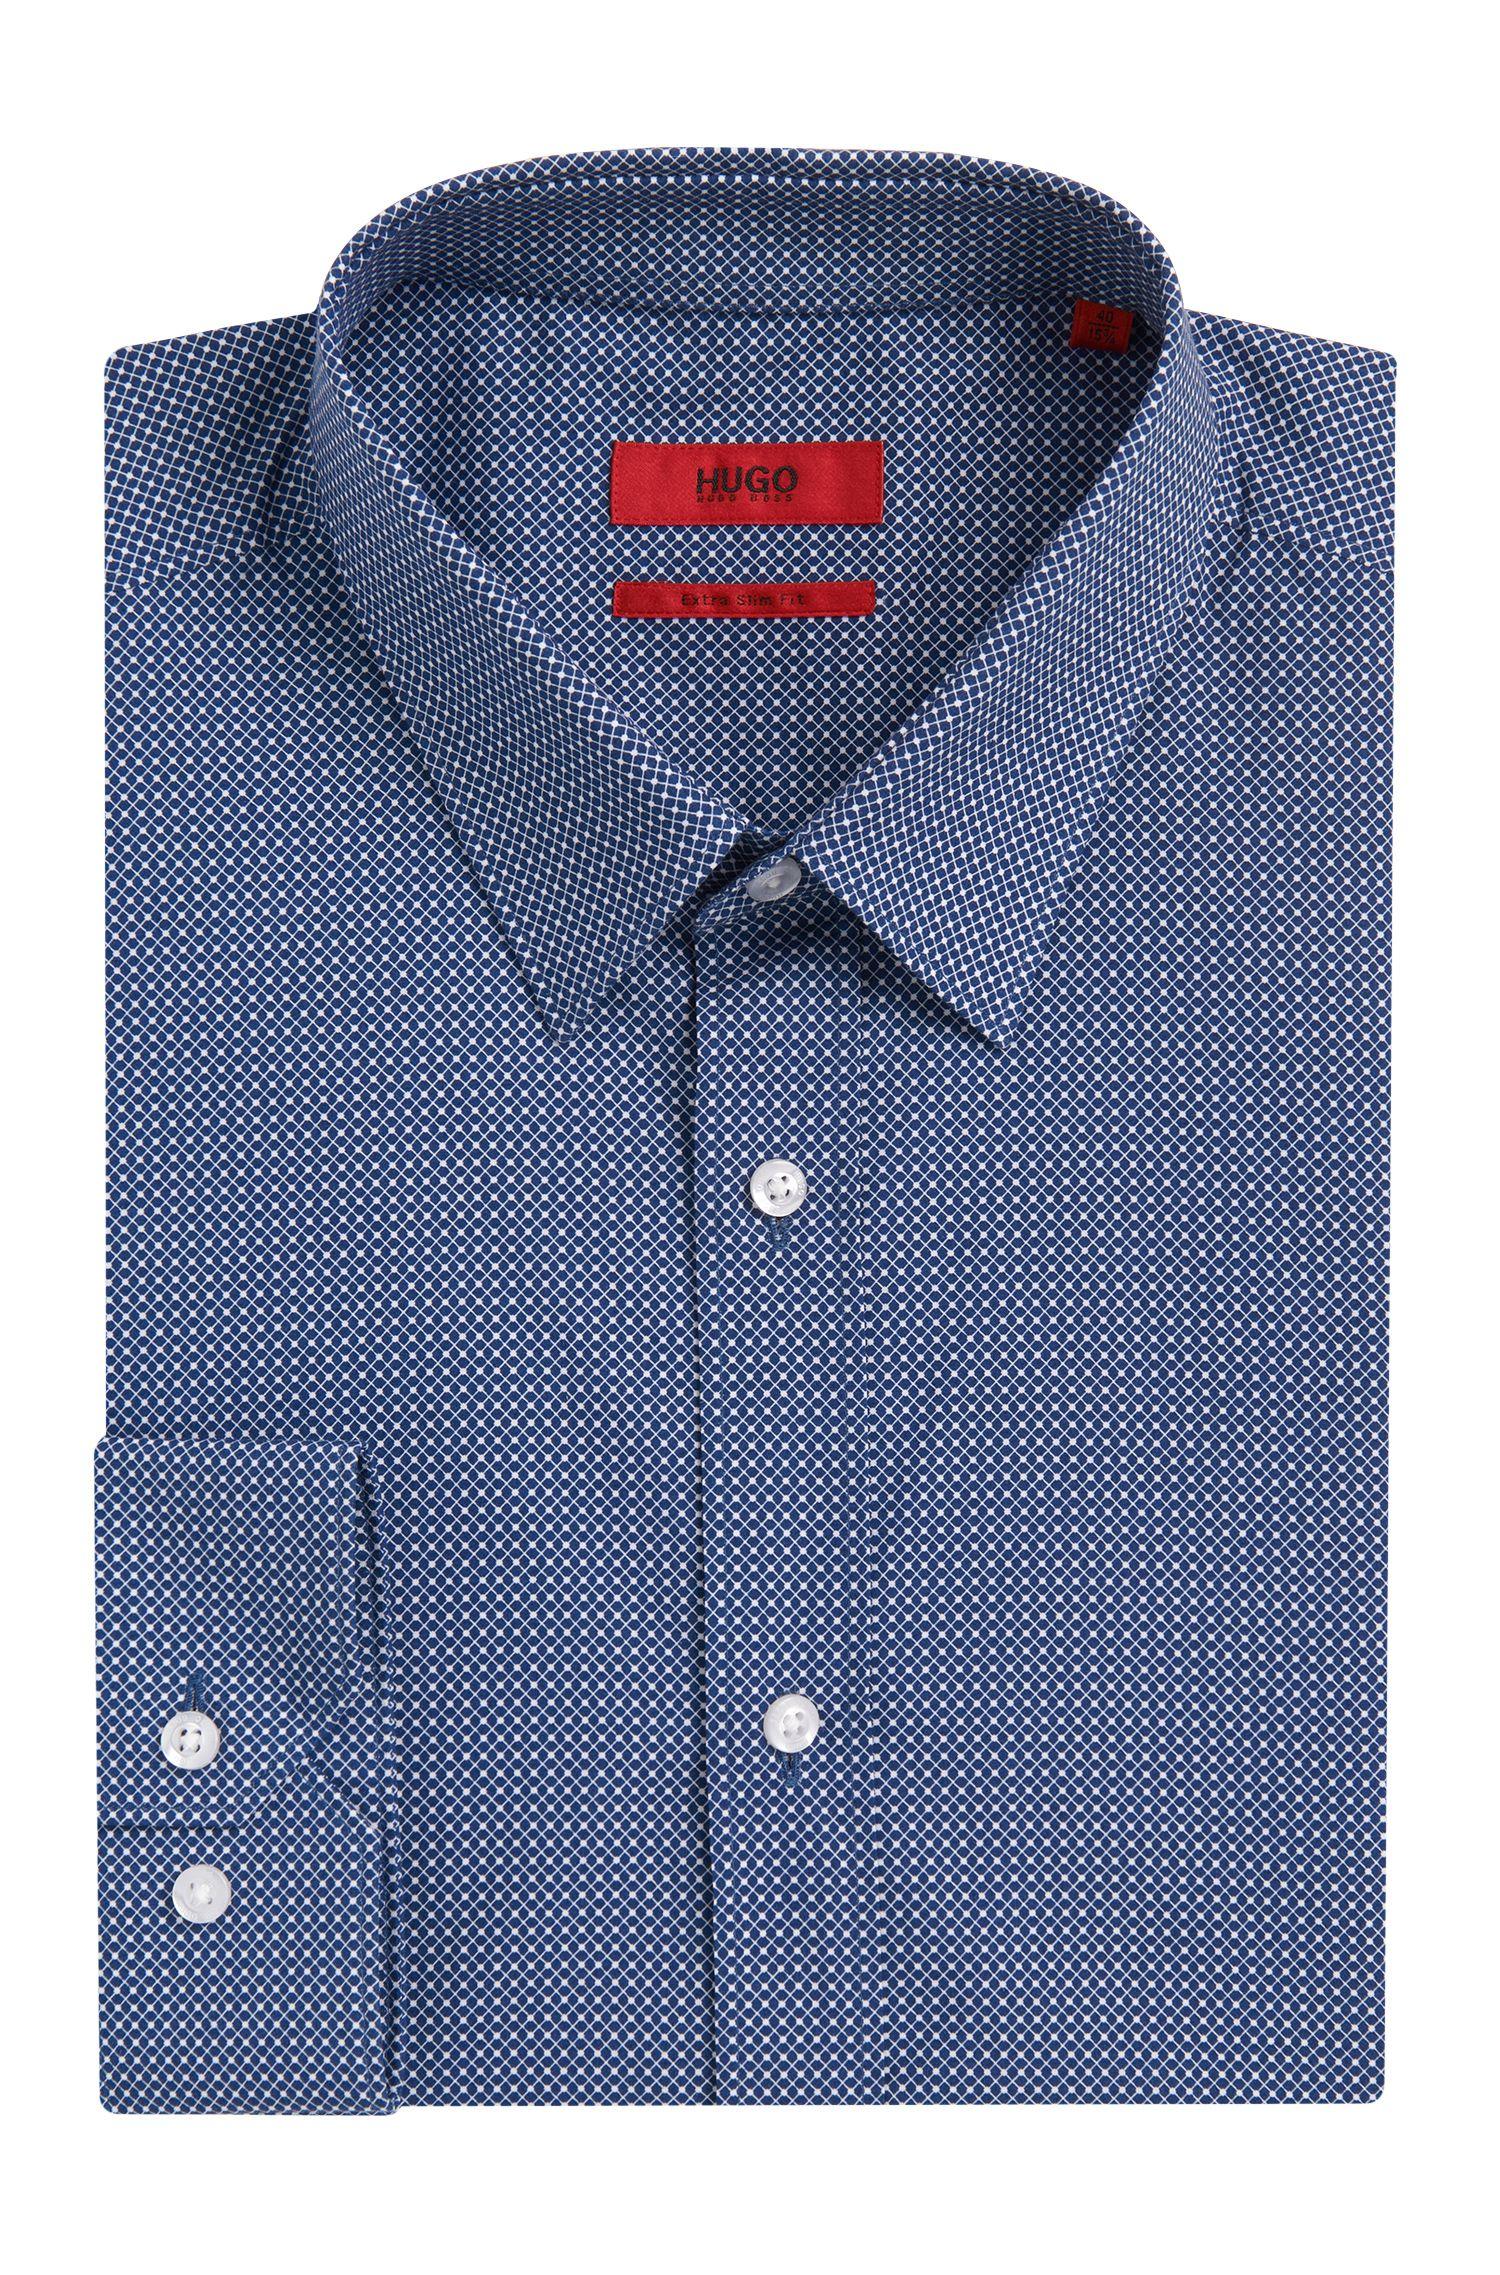 Fein gemustertes Extra Slim-Fit Hemd aus Baumwolle: 'Elisha'